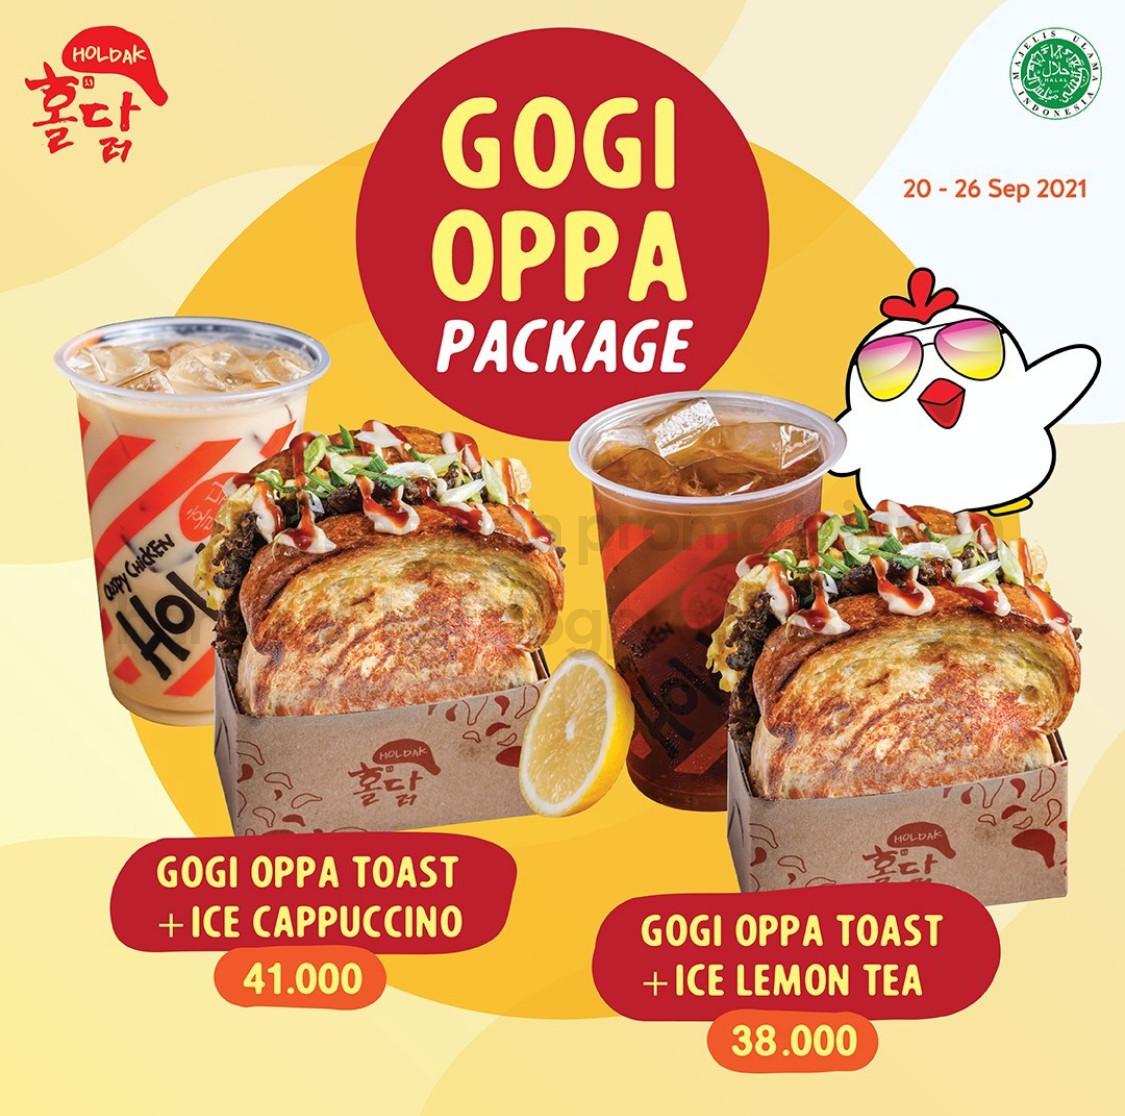 Promo HOLDAK PAKET BUNDLING GOGI OPPA TOAST + ICE LEMON TEA / ICE CAPPUCCINO mulai Rp. 38RIBUAN AJA